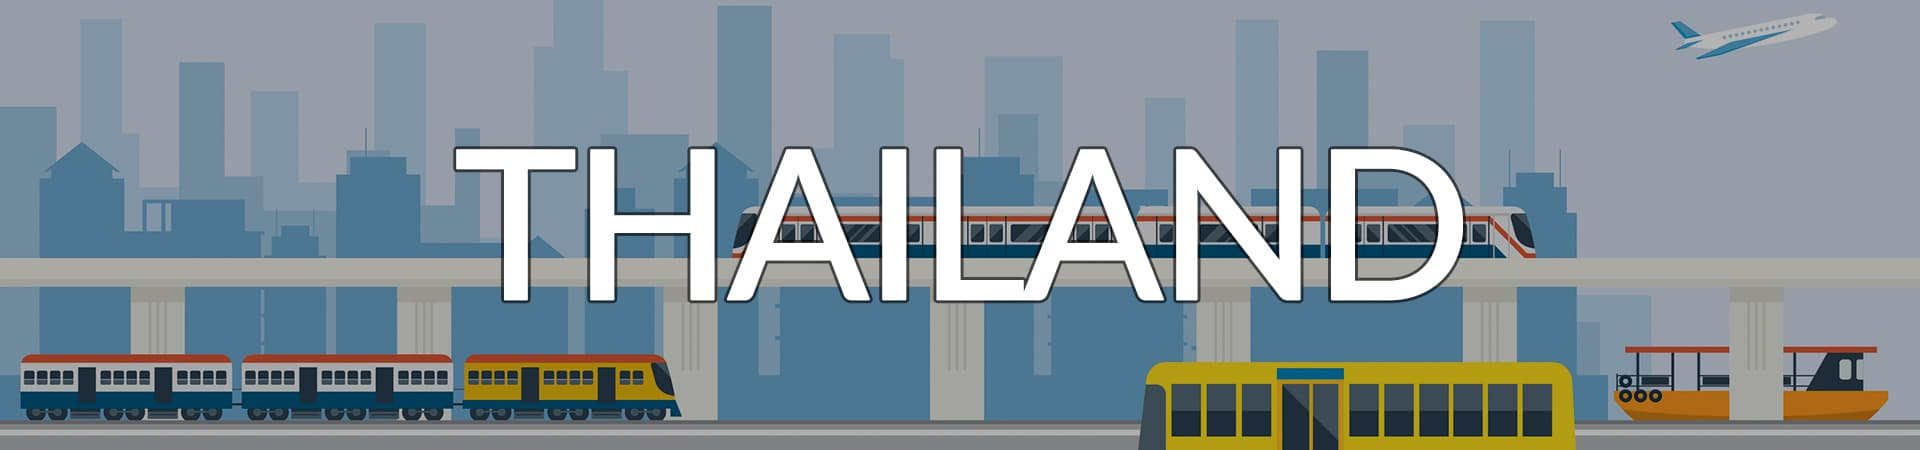 Transportation Thailand banner